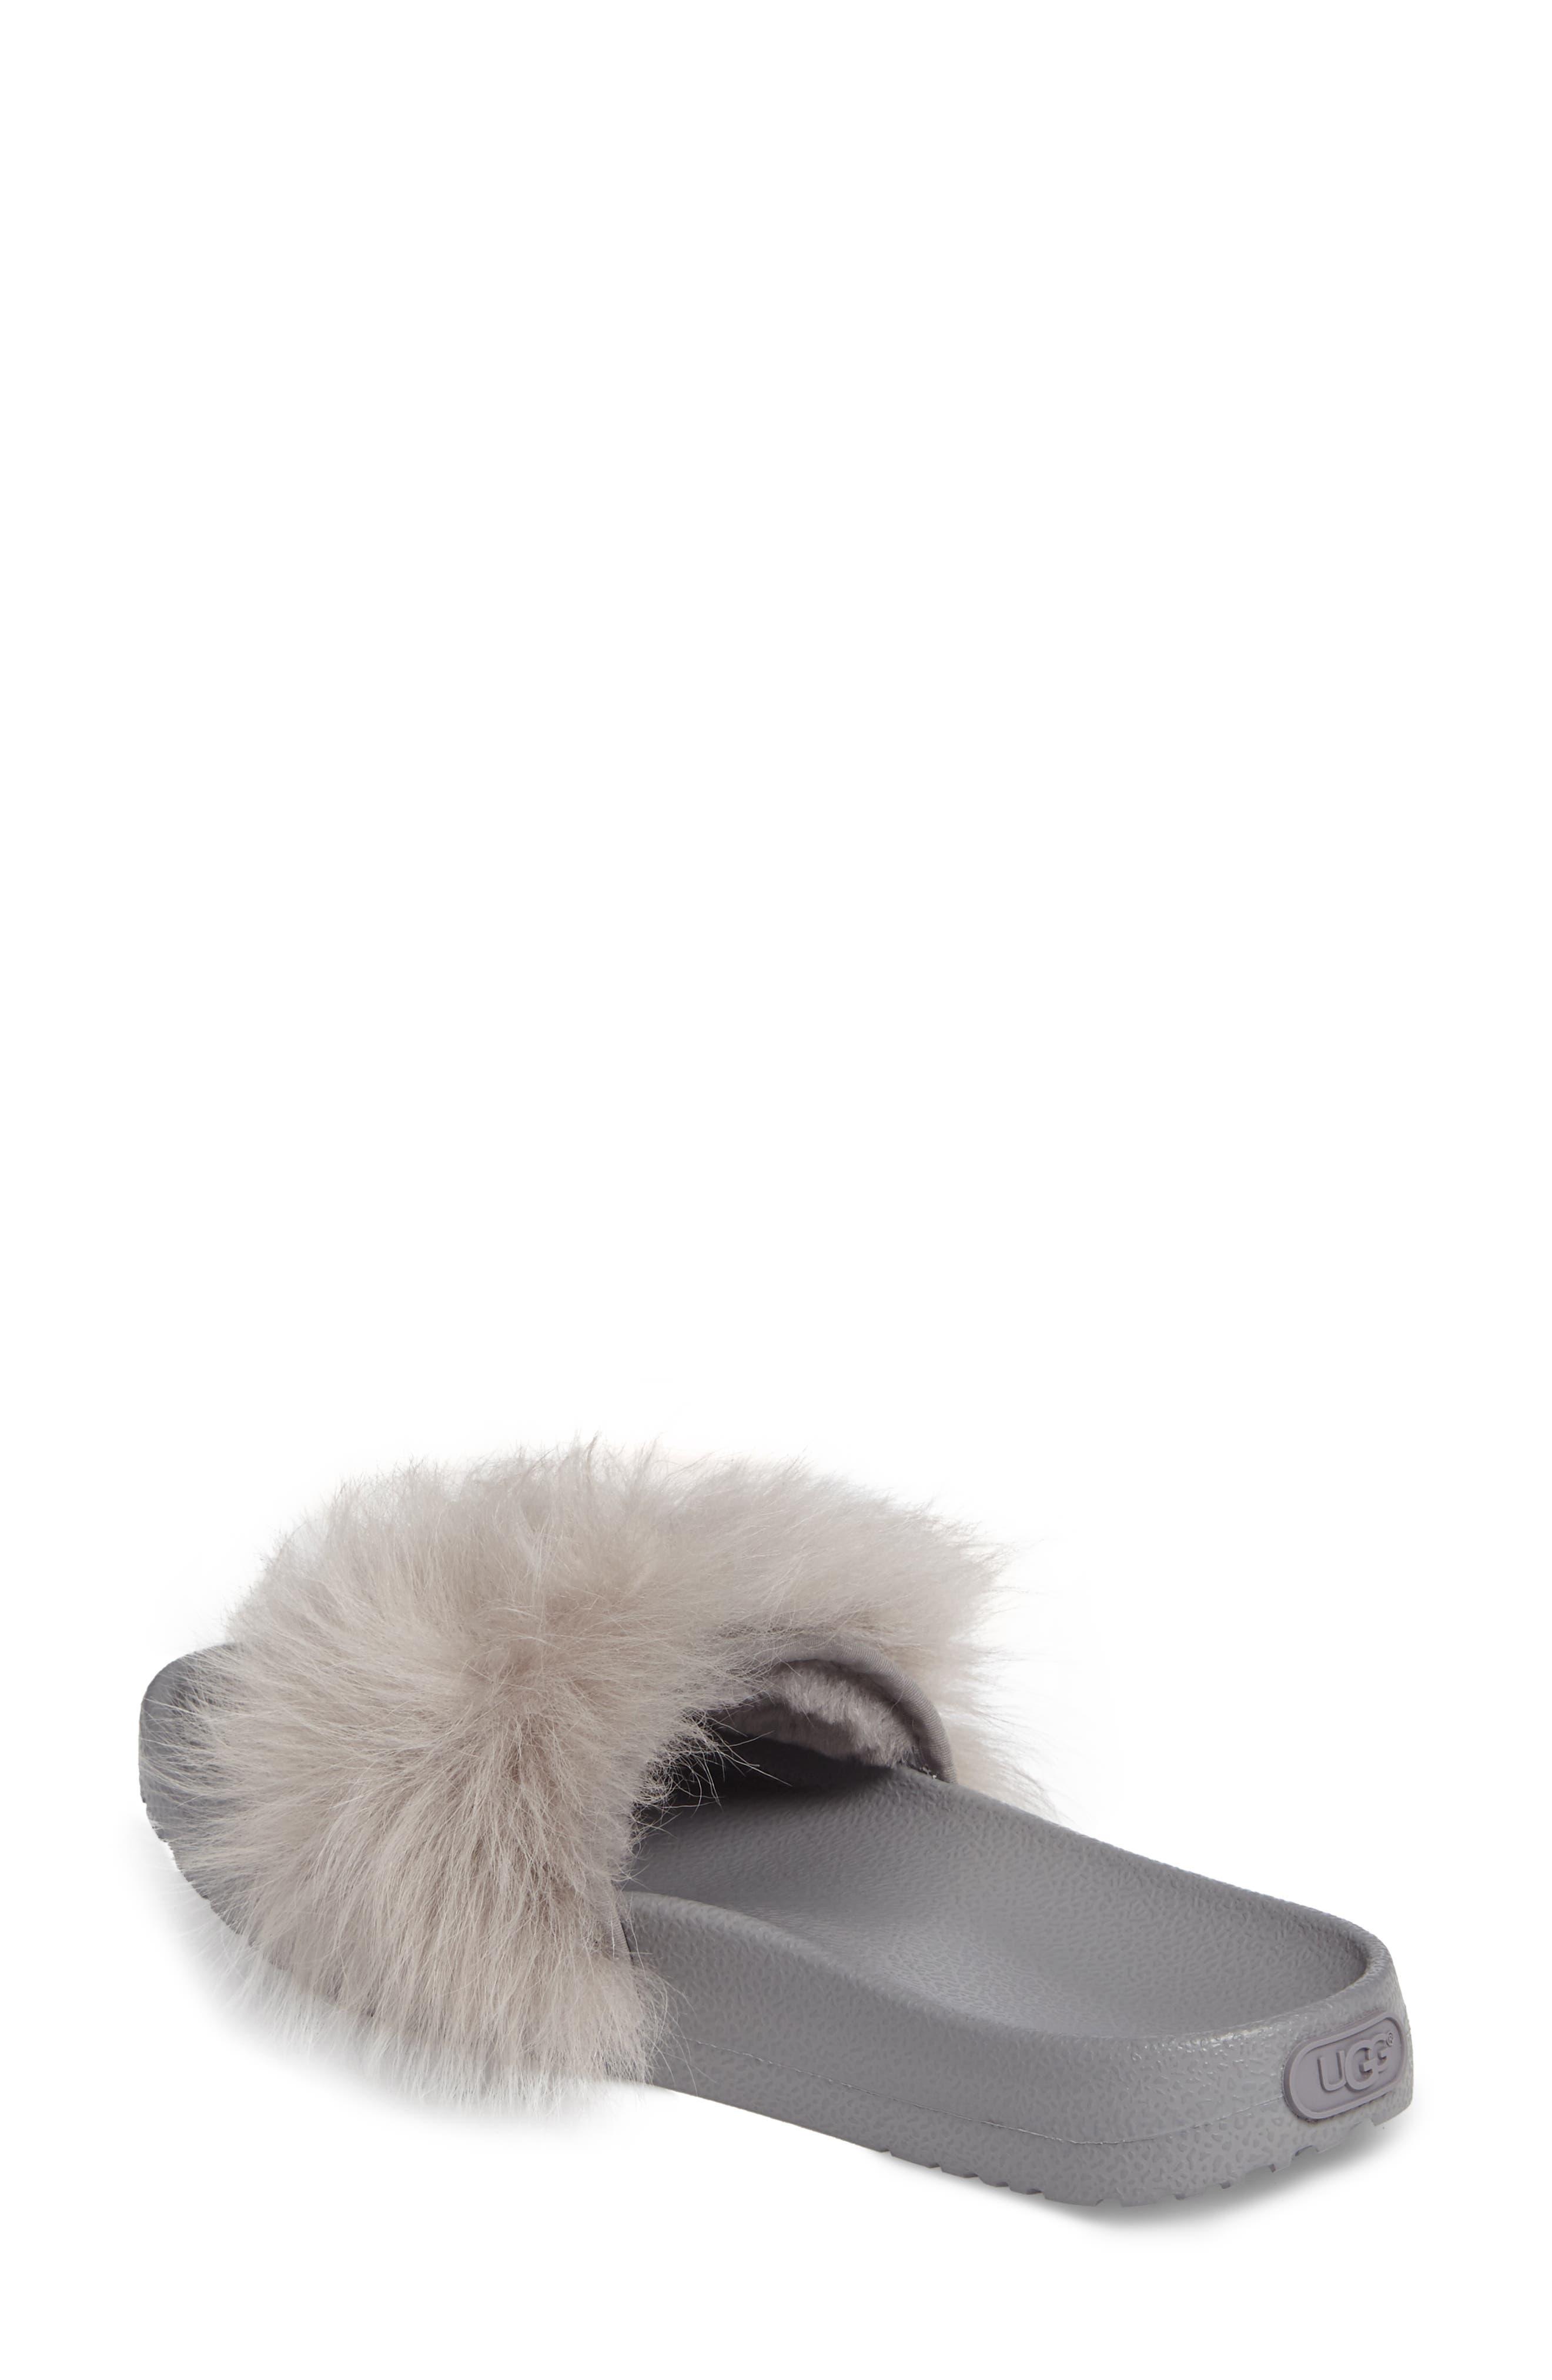 Royale Genuine Shearling Slide Sandal,                             Alternate thumbnail 2, color,                             Seal